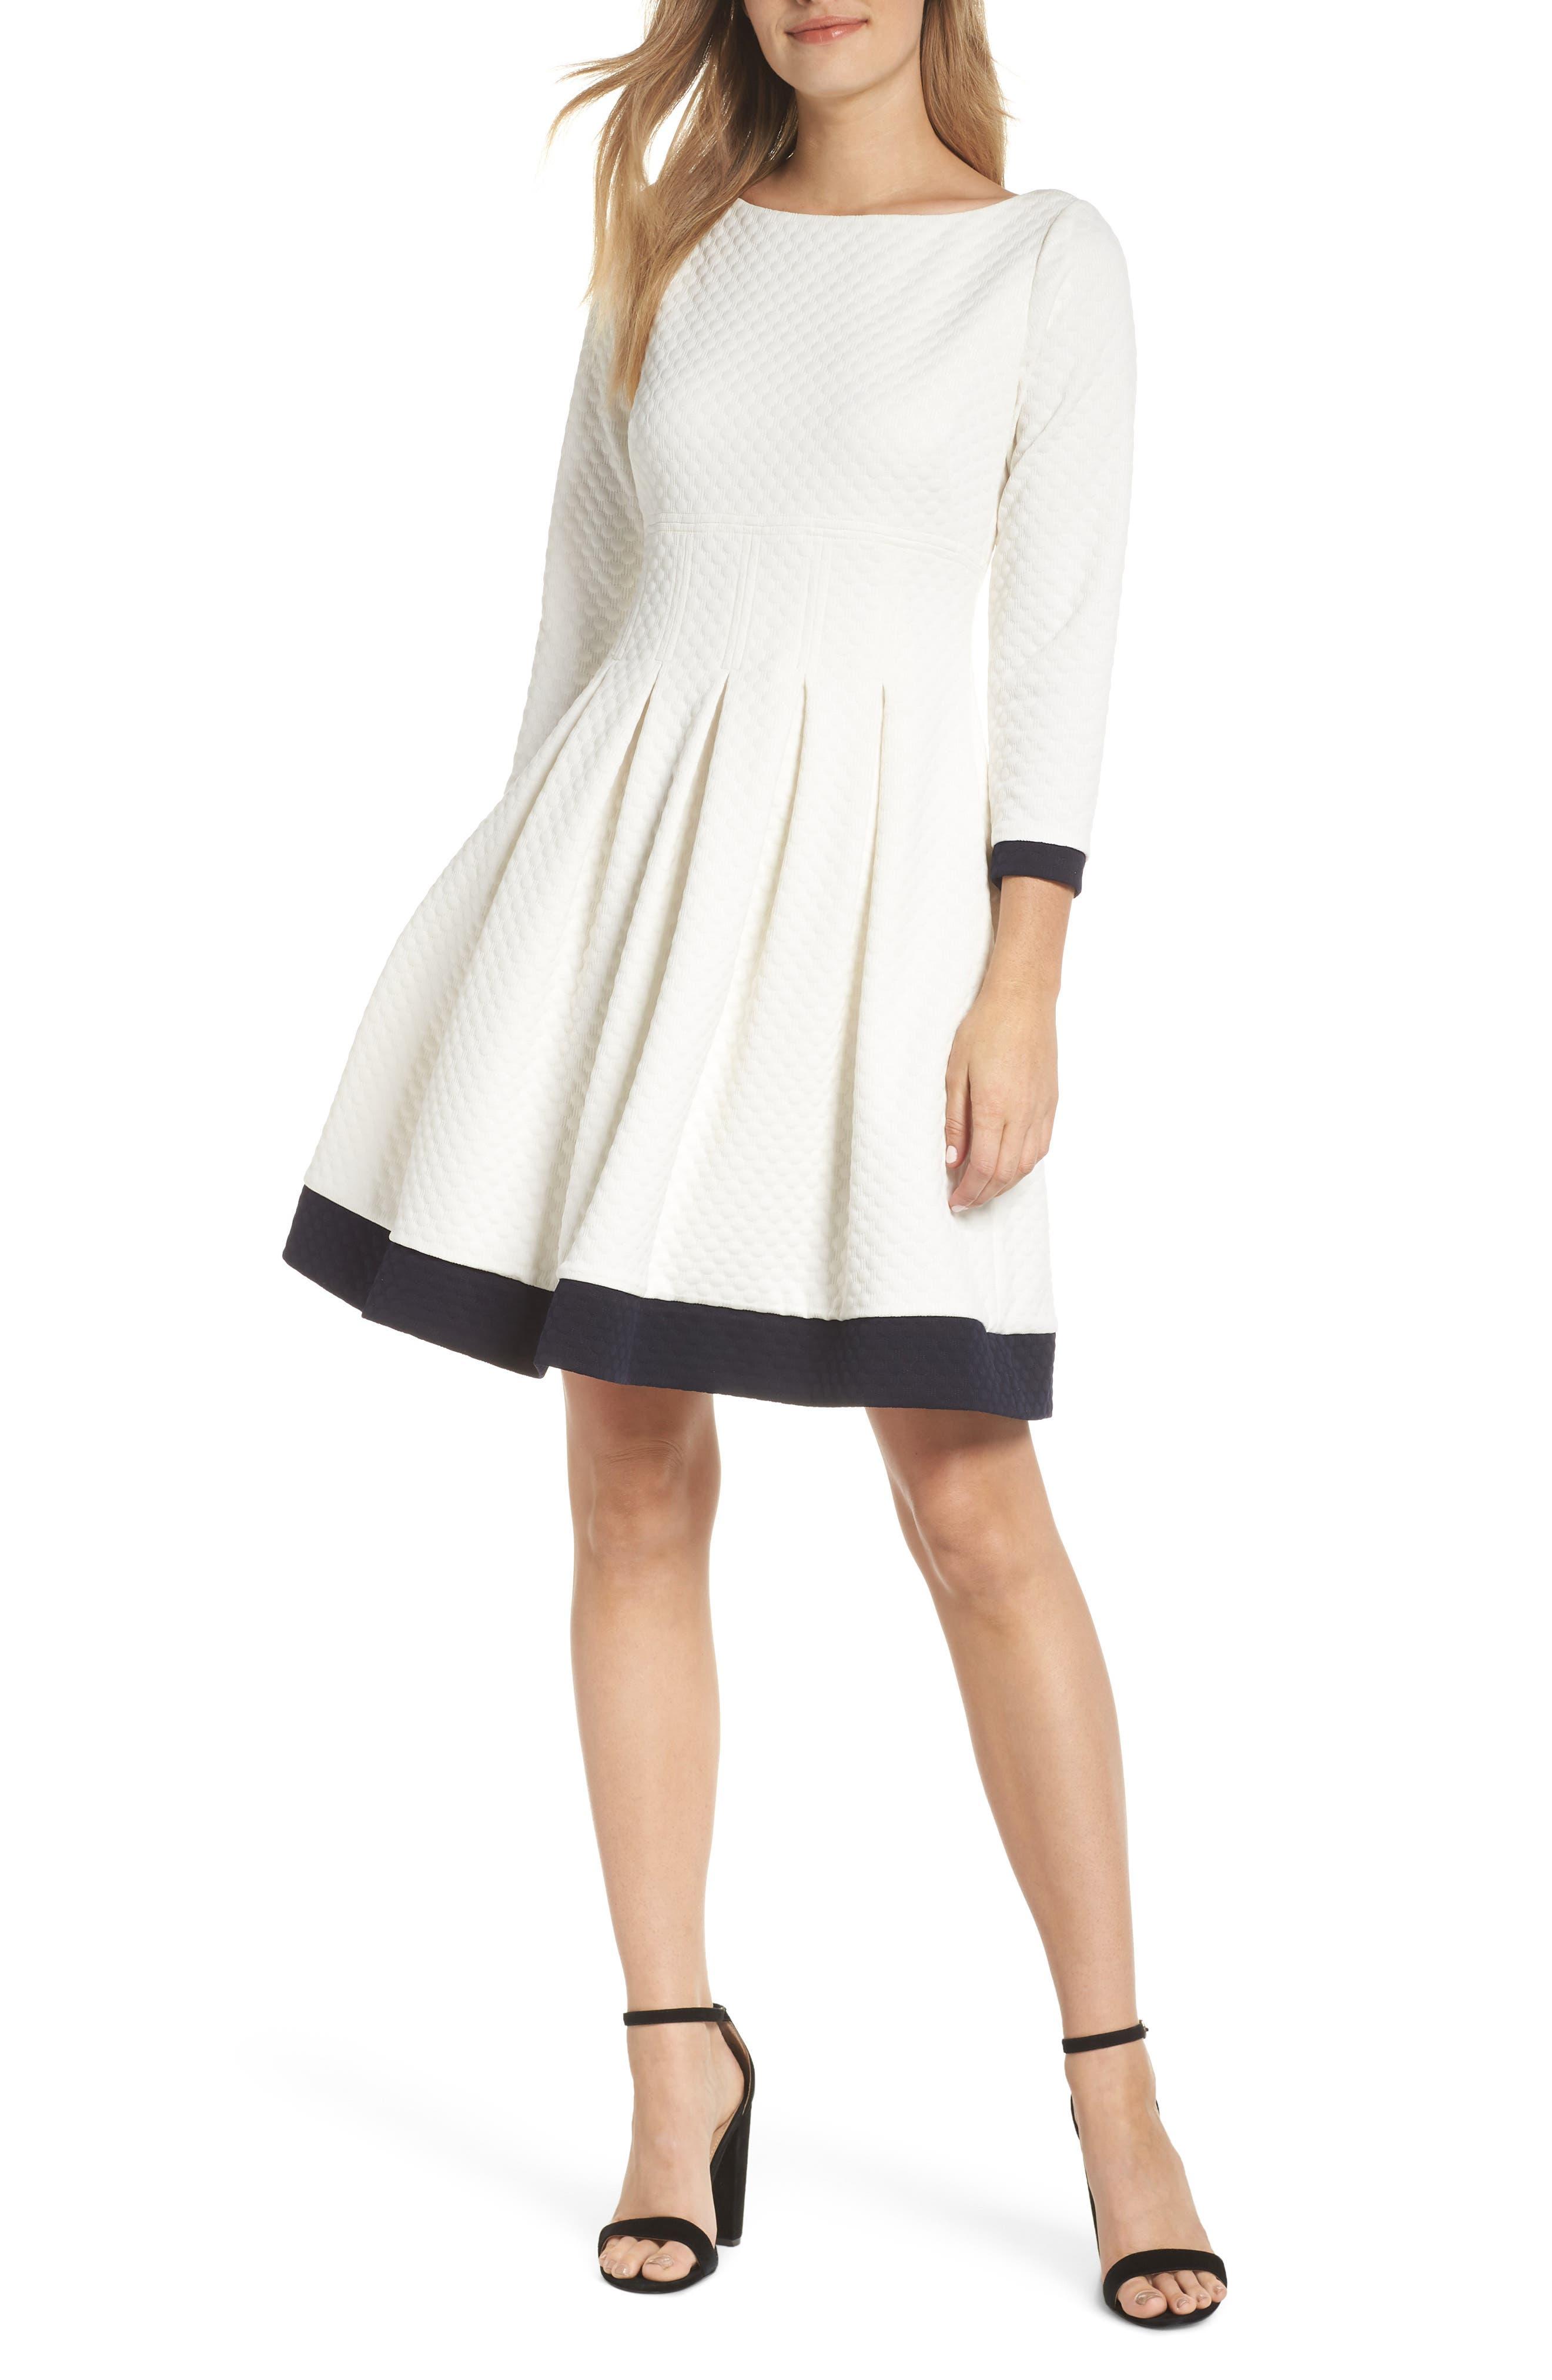 Eliza J Dot Textured Fit & Flare Dress, Ivory